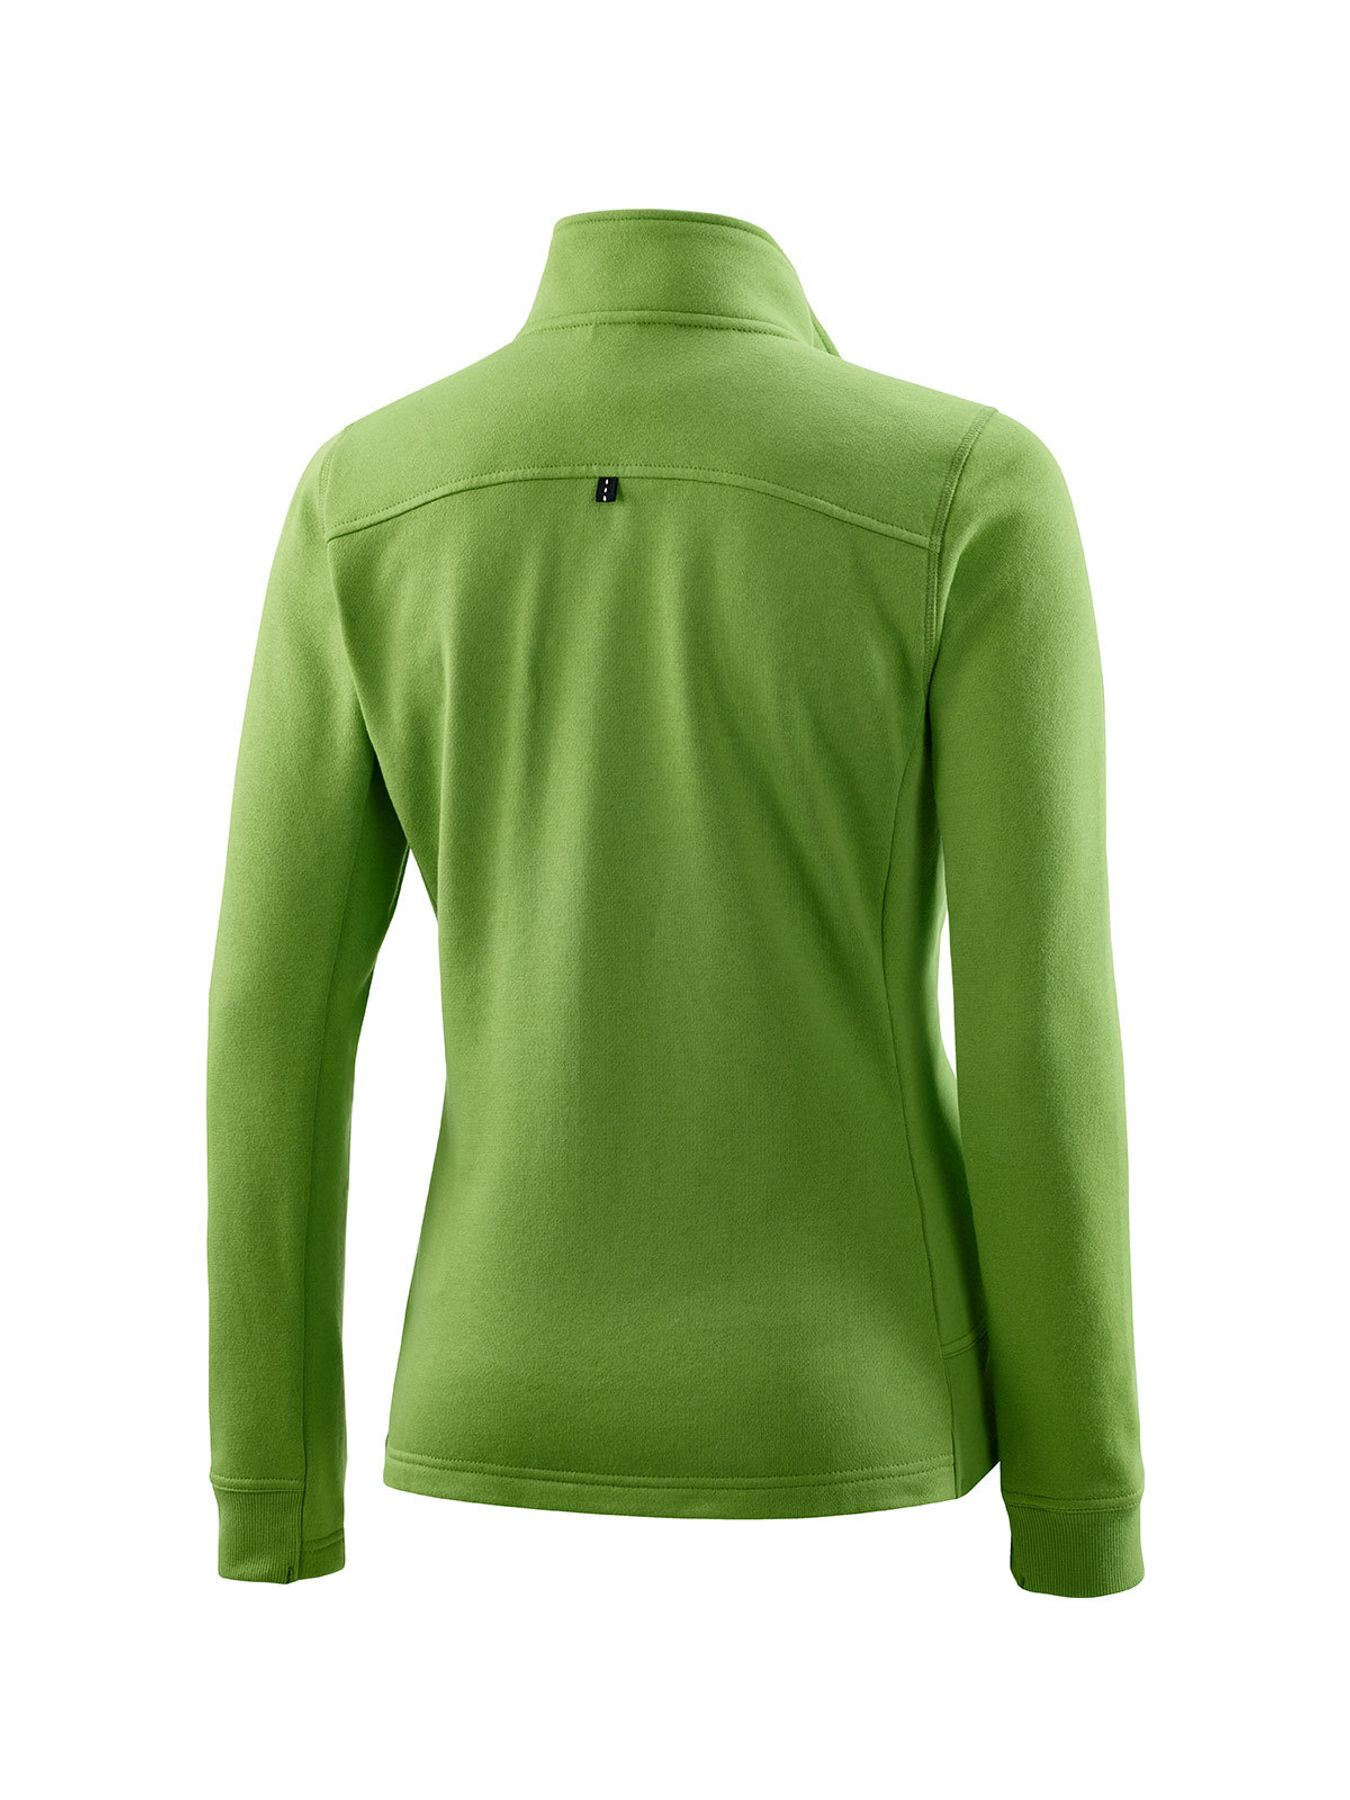 Joy - Damen Sport und Freizeit Jacke in mehreren Farben, Paulina (34500 A) – Bild 2